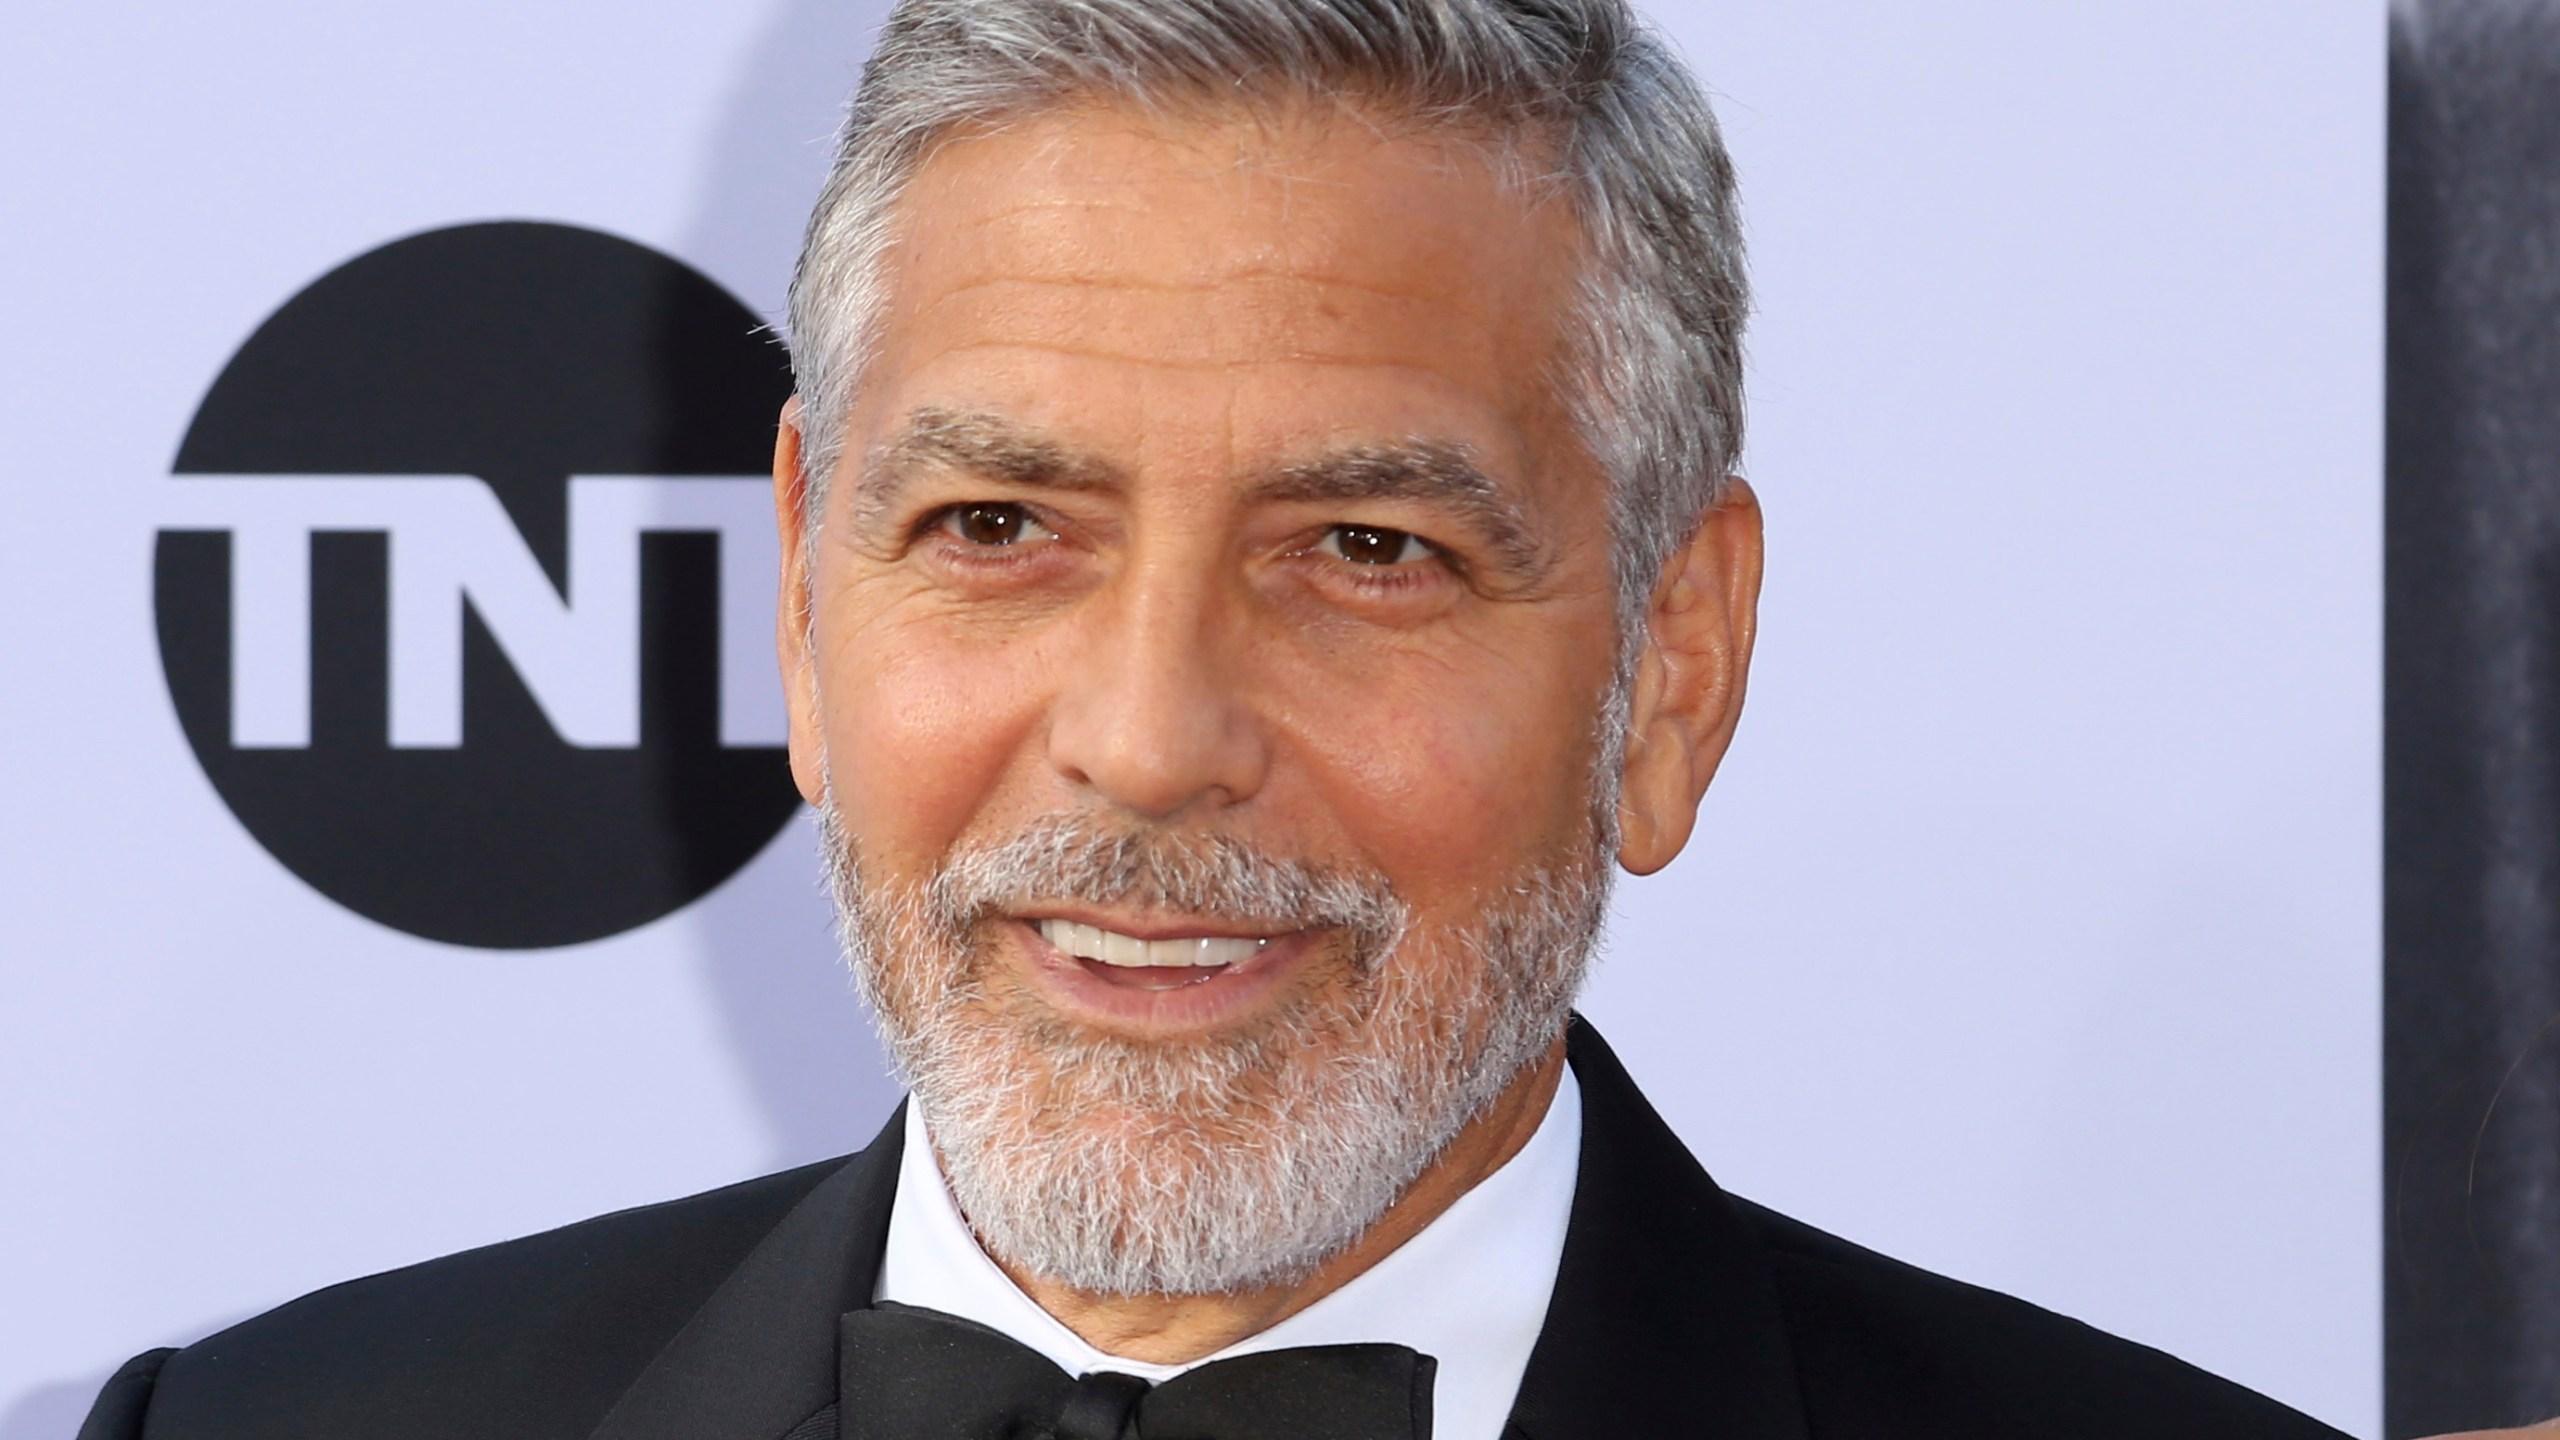 Italy_Clooney_Hurt_55854-159532.jpg82131577